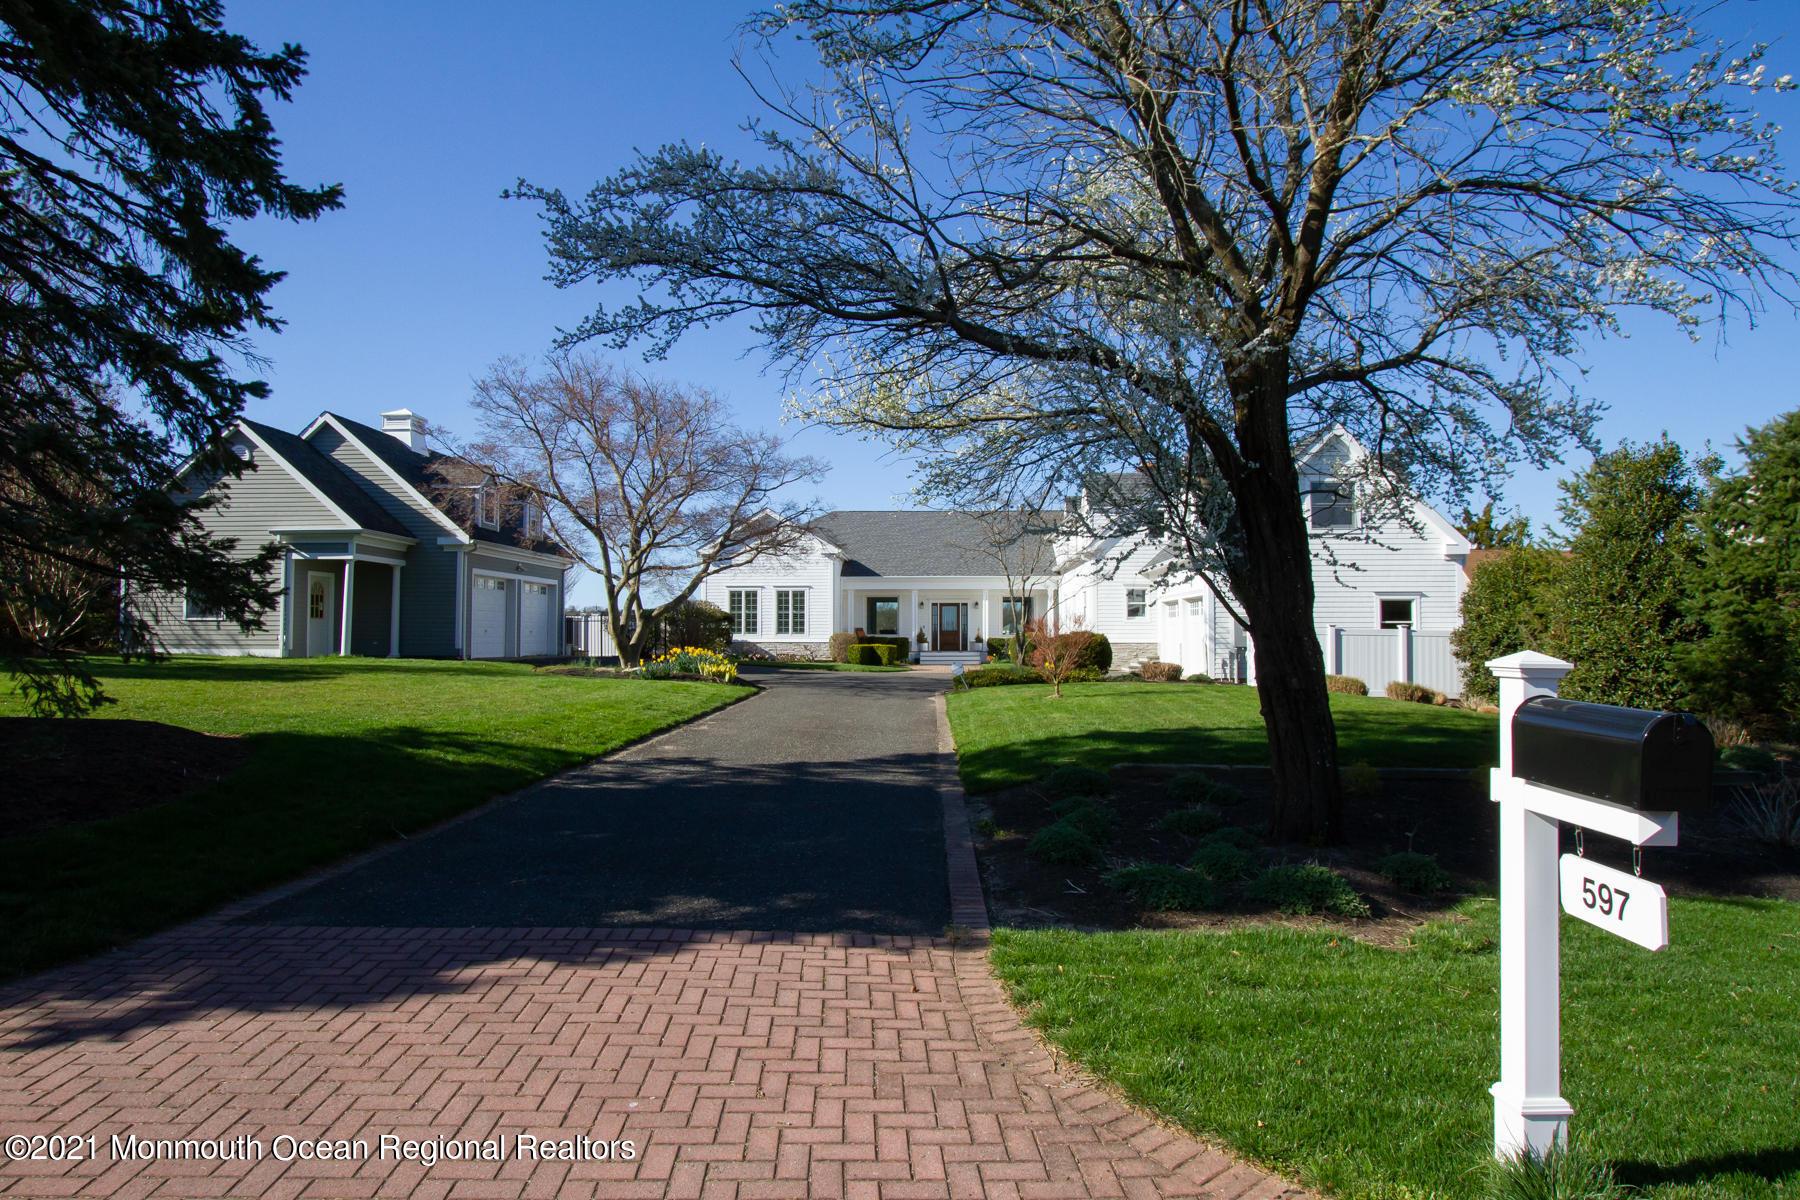 597 Little Silver Point Road, Little Silver, New Jersey 07739, 5 Bedrooms Bedrooms, ,6 BathroomsBathrooms,Single Family,For Sale,597 Little Silver Point Road,2,22111014